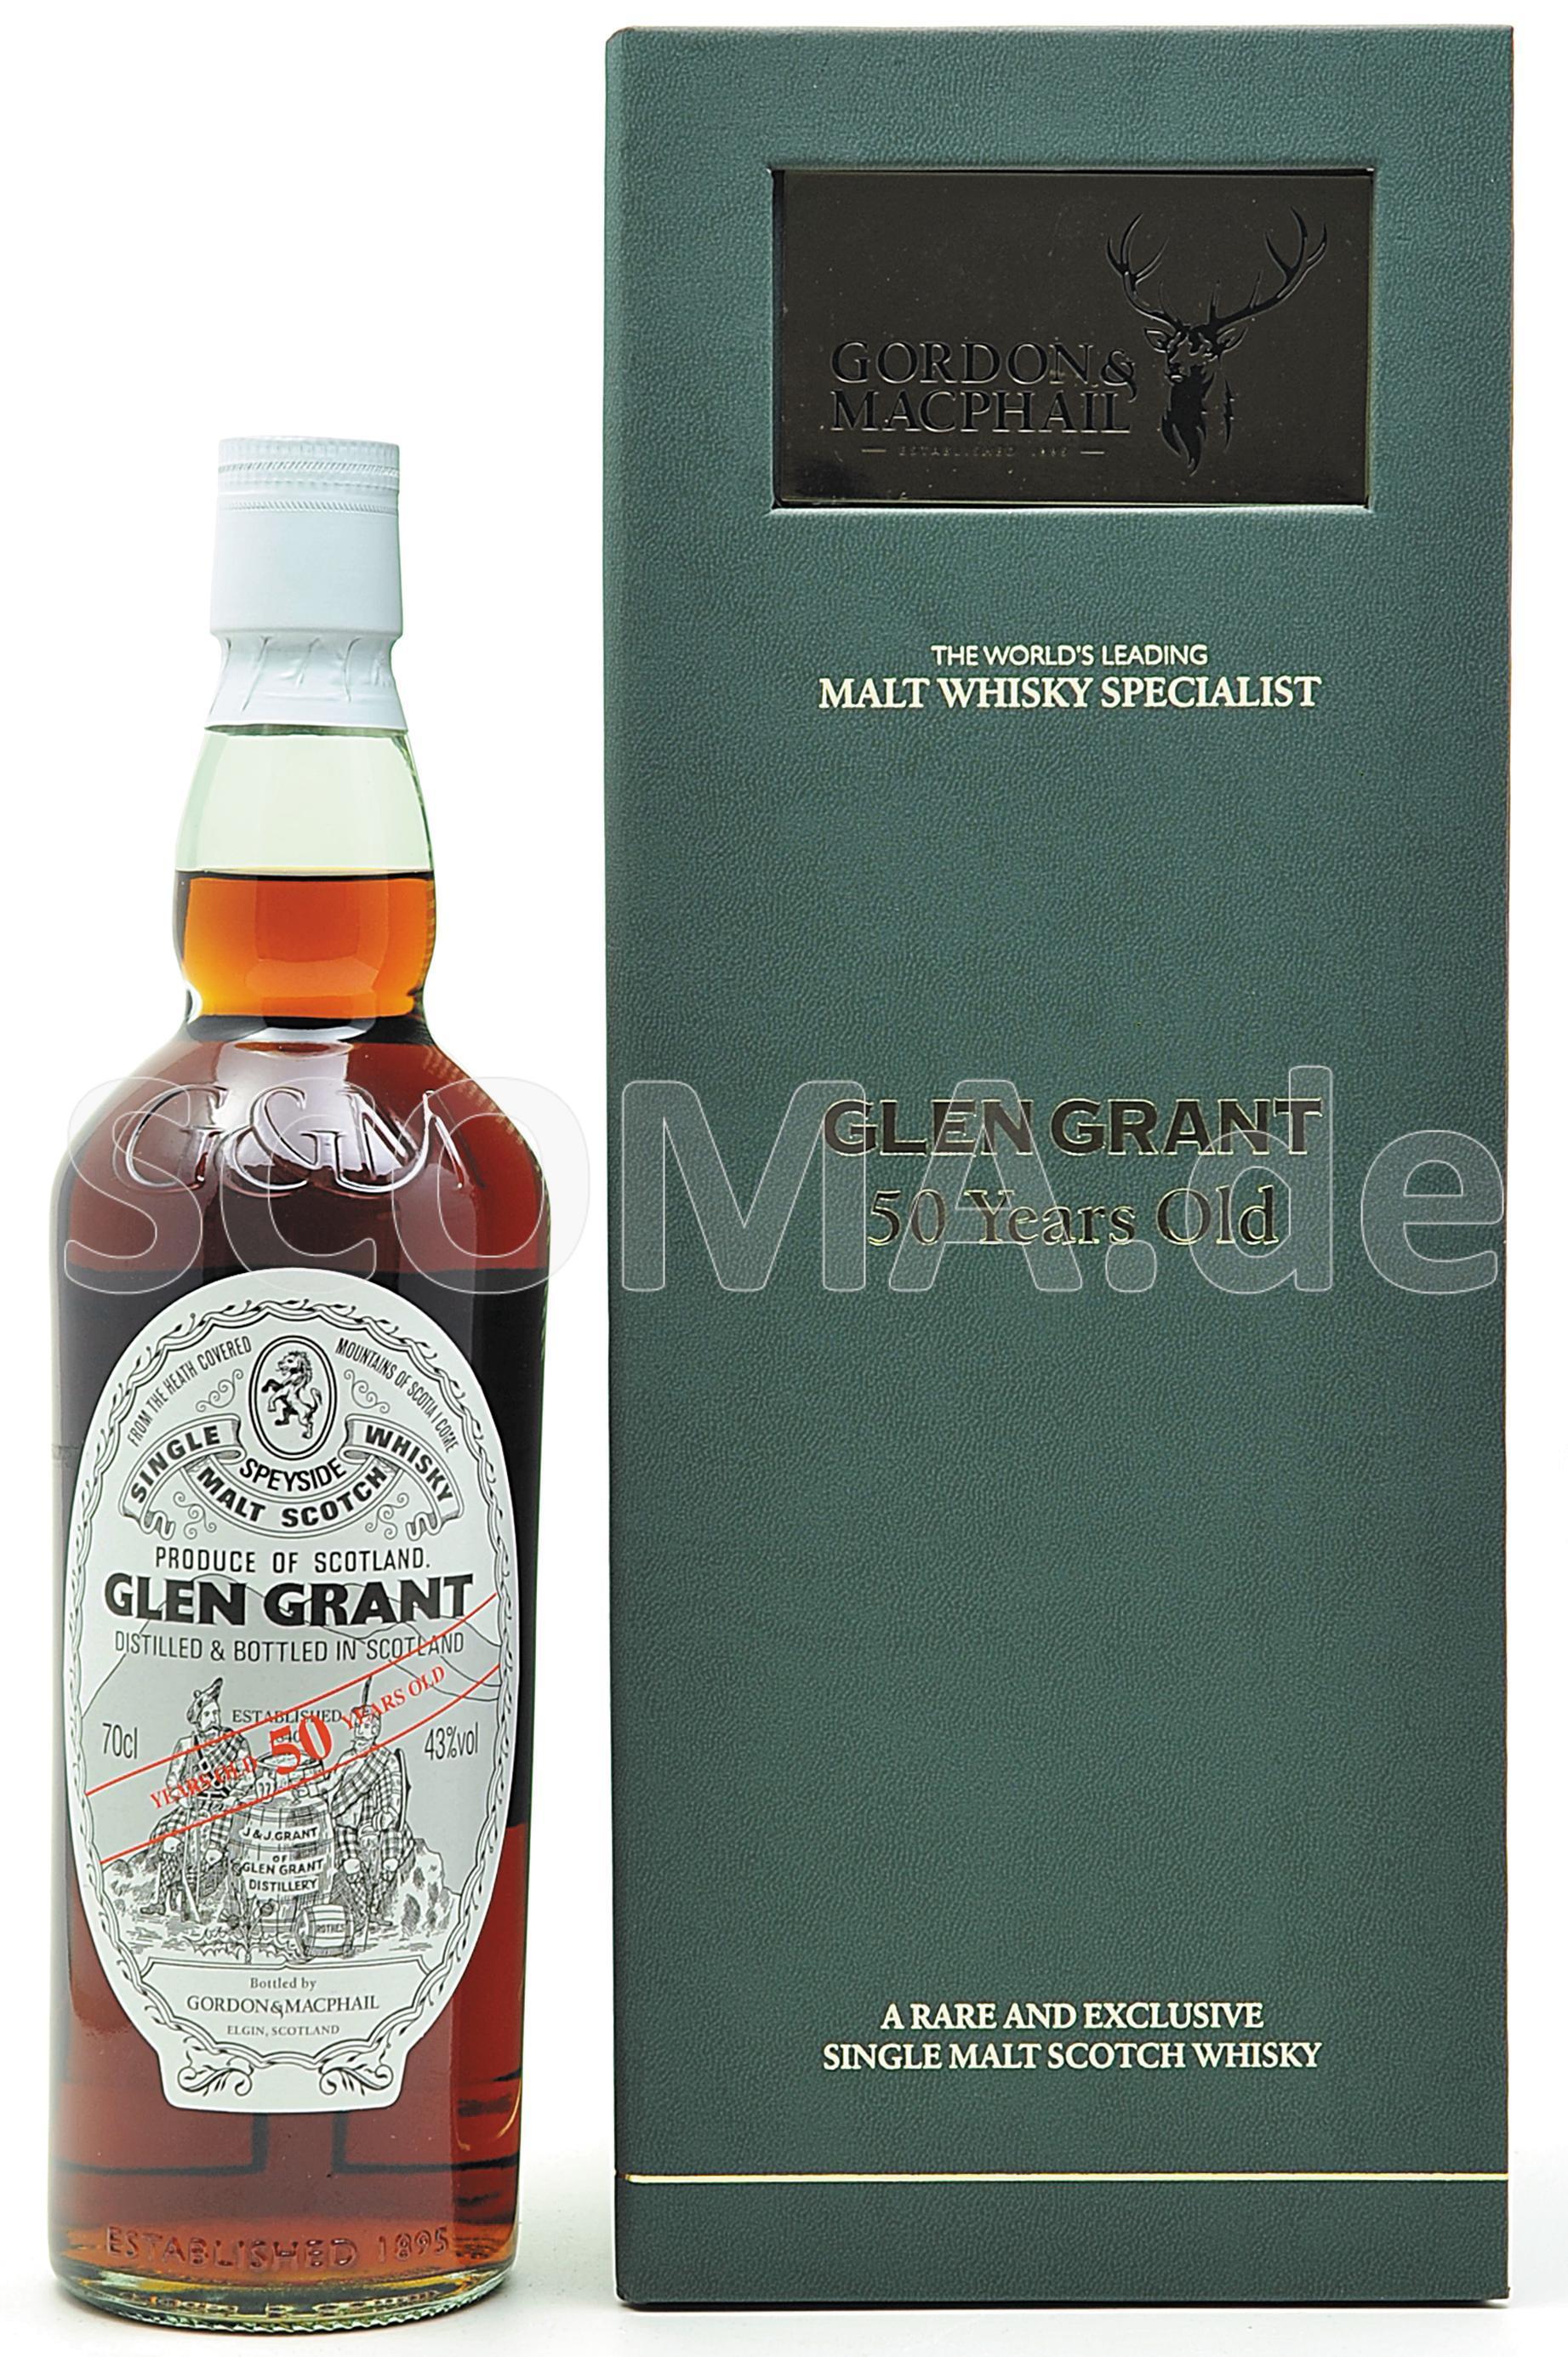 Glen Grant 50 years